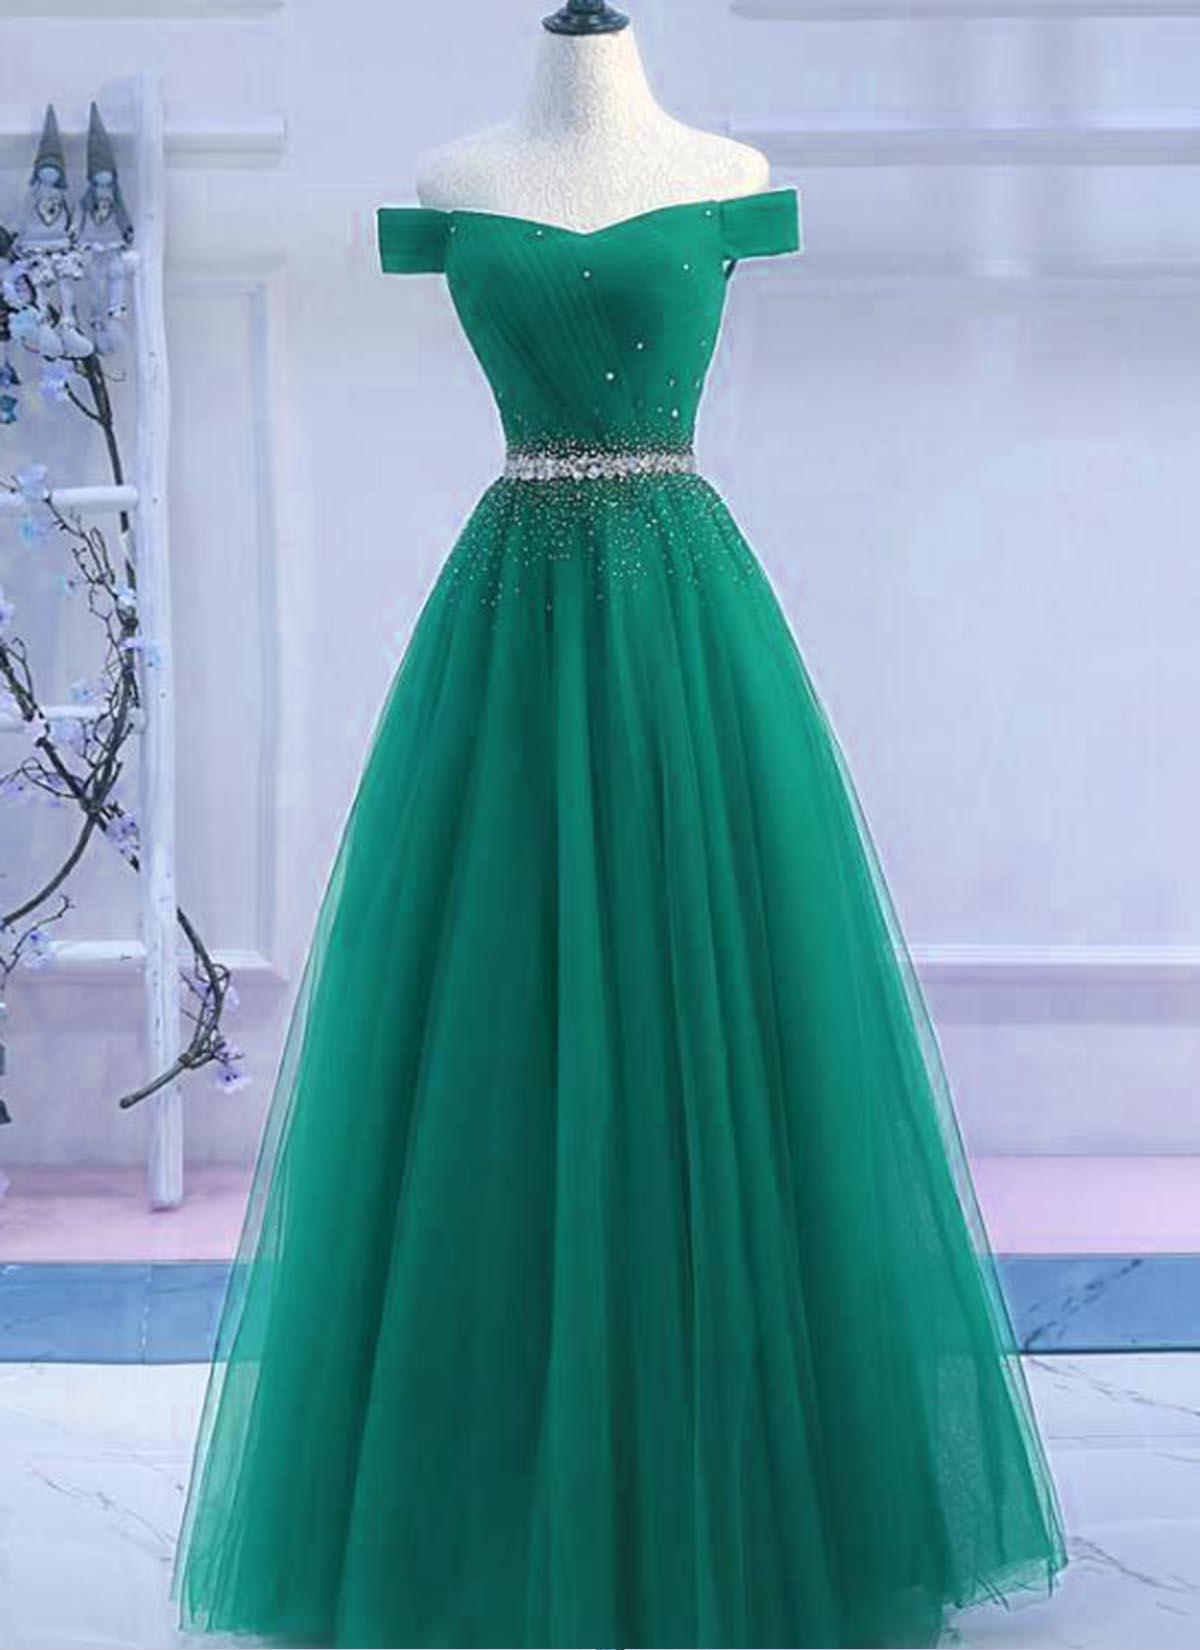 edd0d30e698 Green Tulle Off Shoulder Long A Line Prom Dress, Sequined Evening Dress